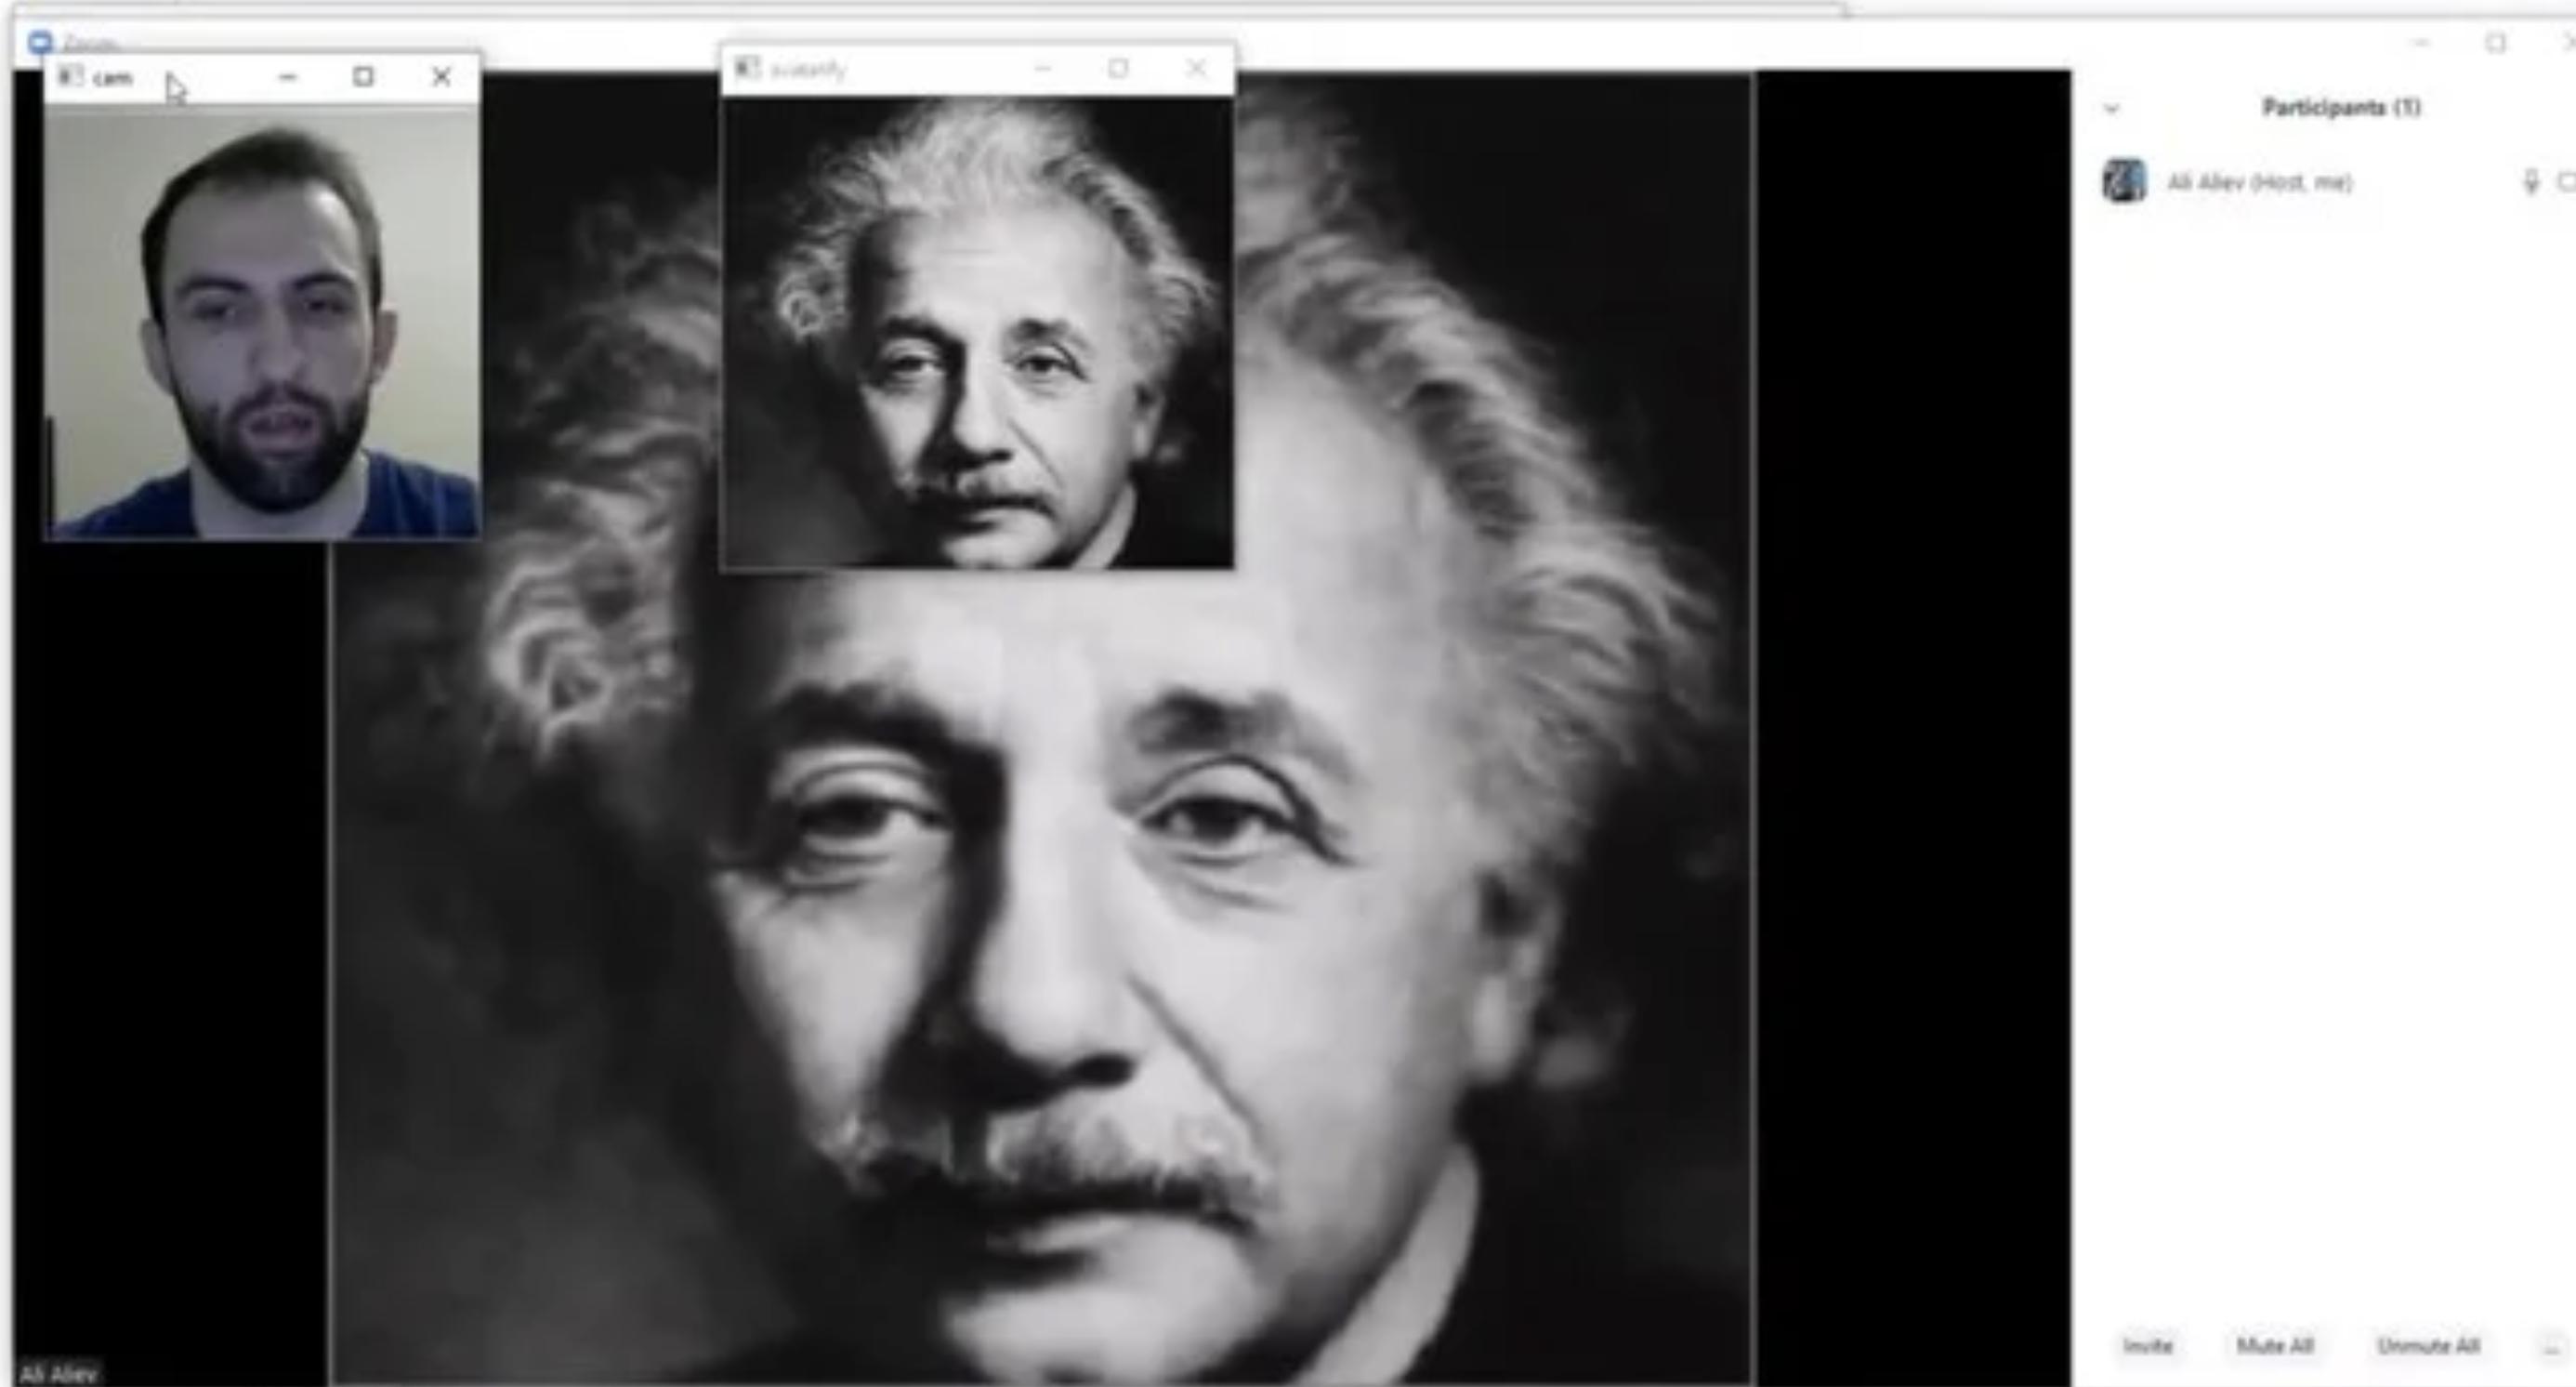 Avatarify 手軽なディープフェイクの作り方 〜画像の顔をフェイストラッキングで操る〜